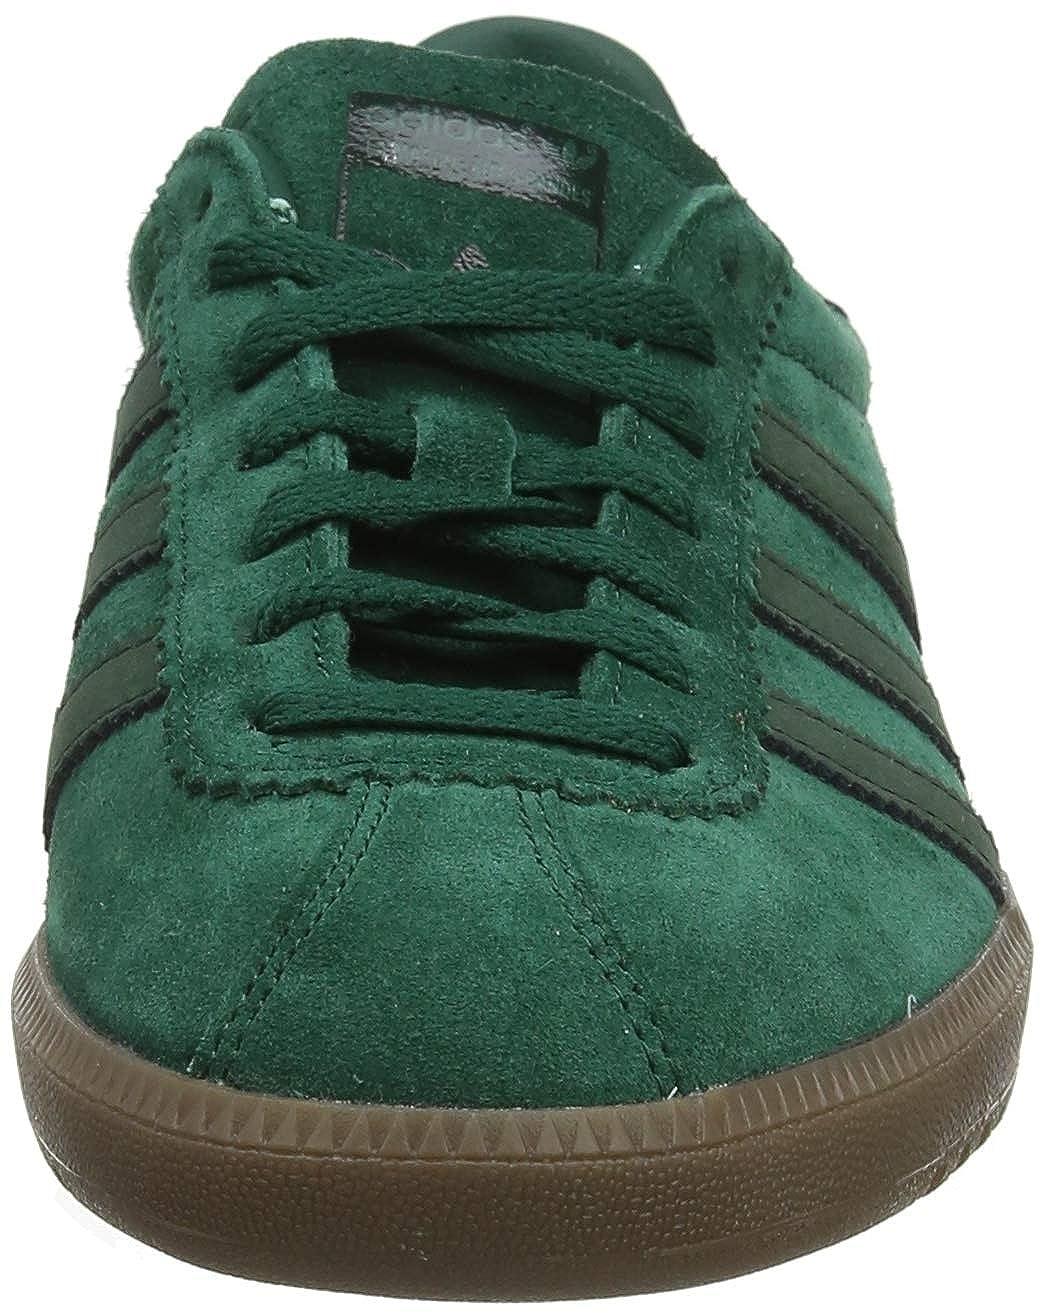 sale retailer ea6f1 b1e42 Adidas Bermuda, Scarpe da Fitness Uomo, Verde (Veruni Vernoc   Gum5), 36  EU  Amazon.it  Scarpe e borse